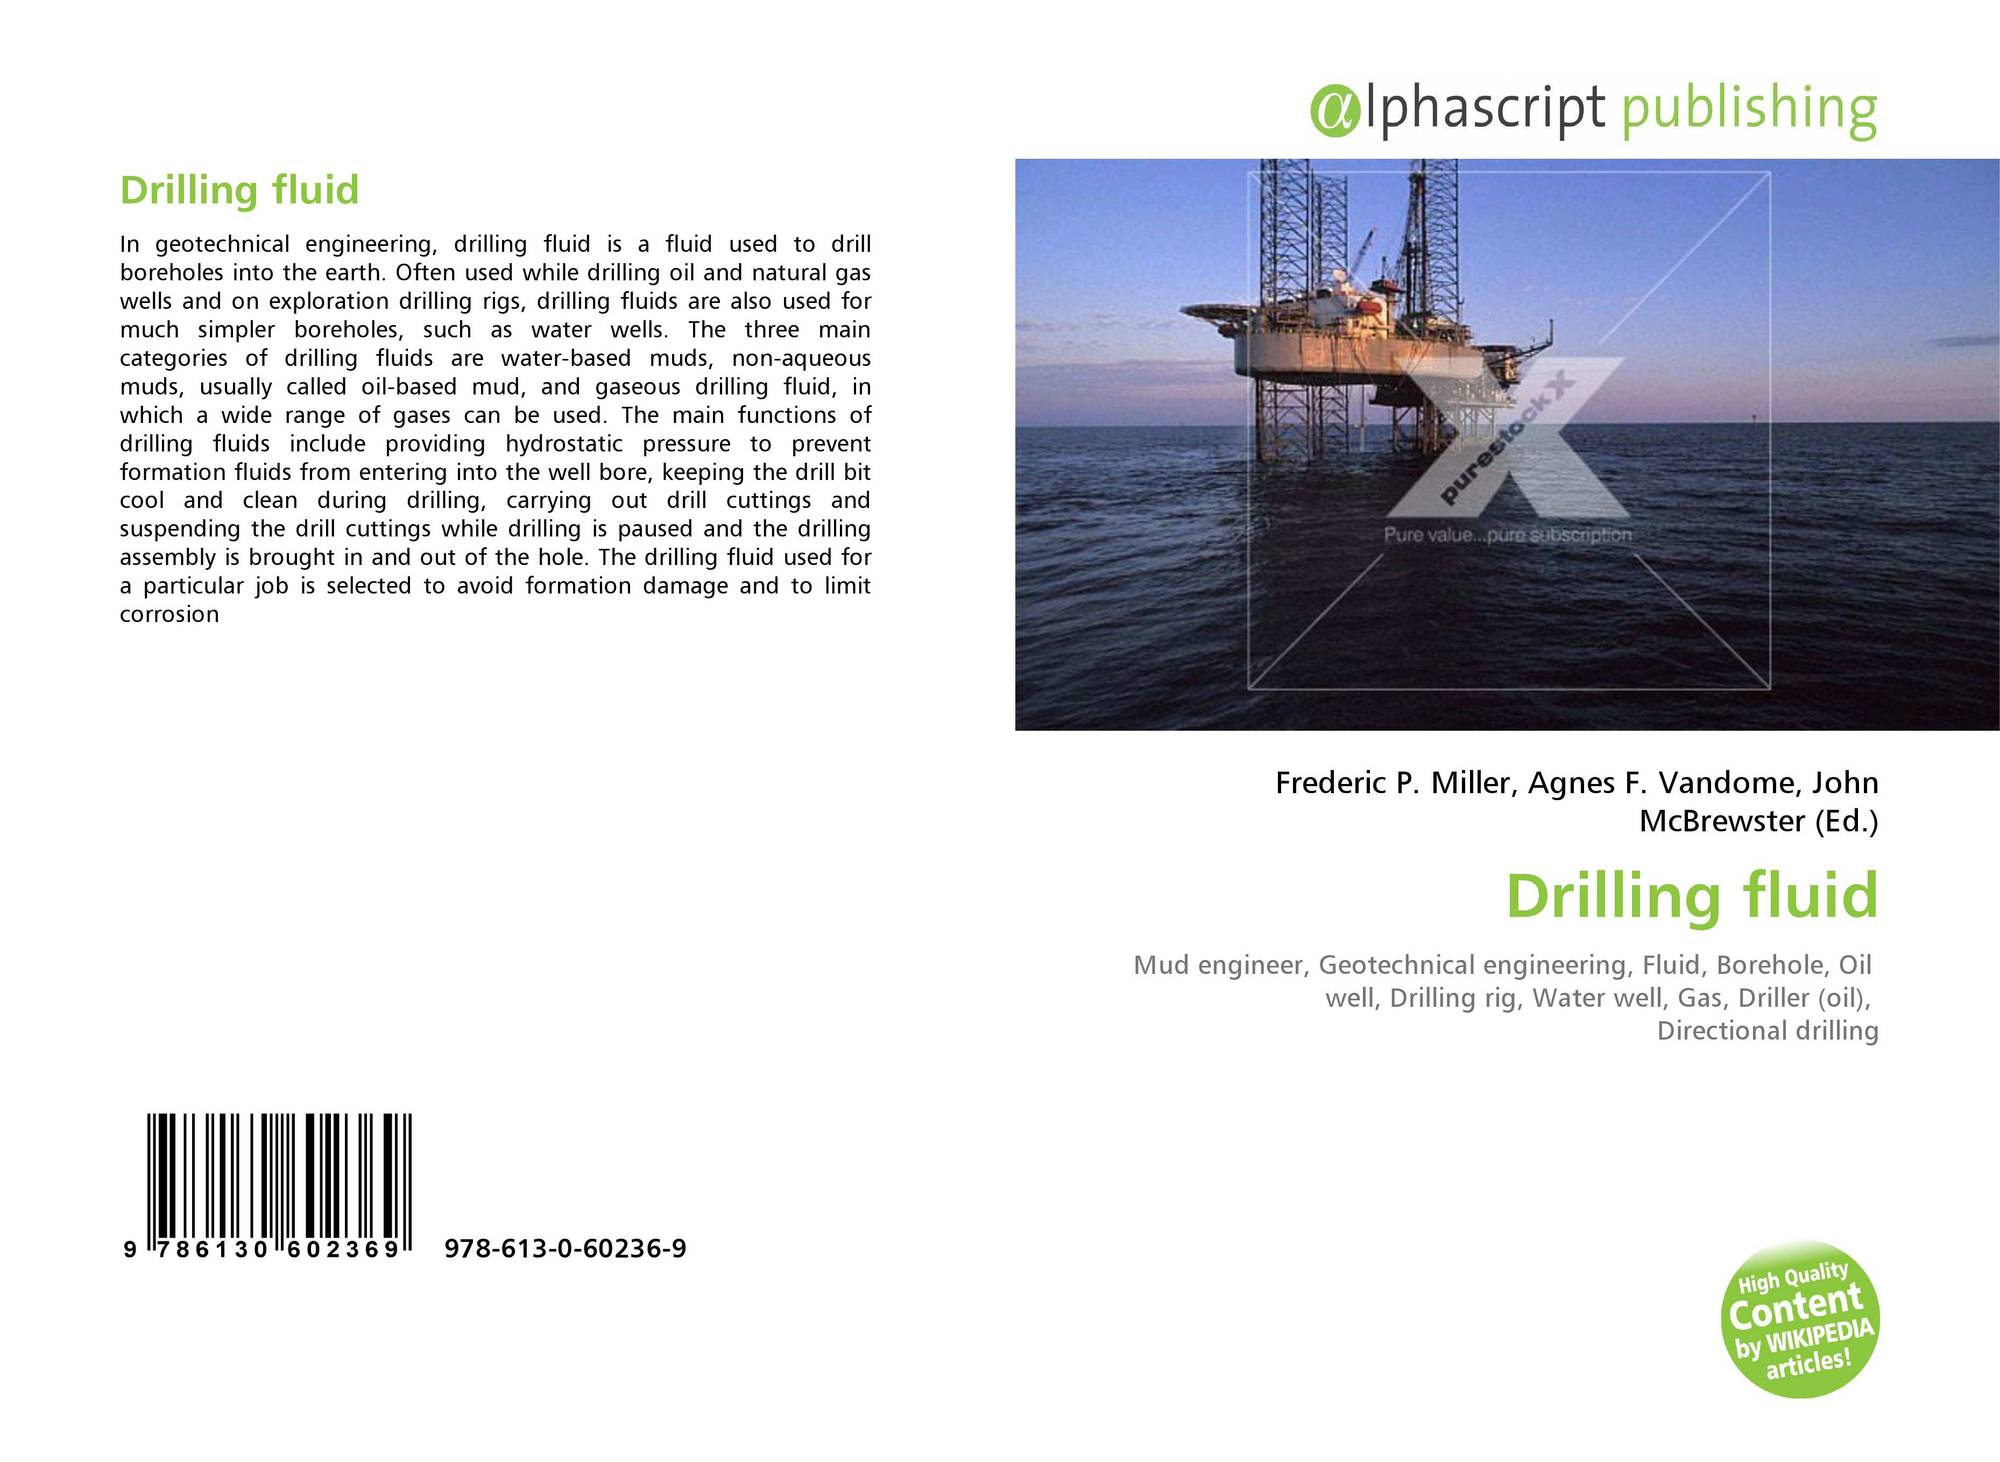 Drilling fluid, 978-613-0-60236-9, 6130602367 ,9786130602369